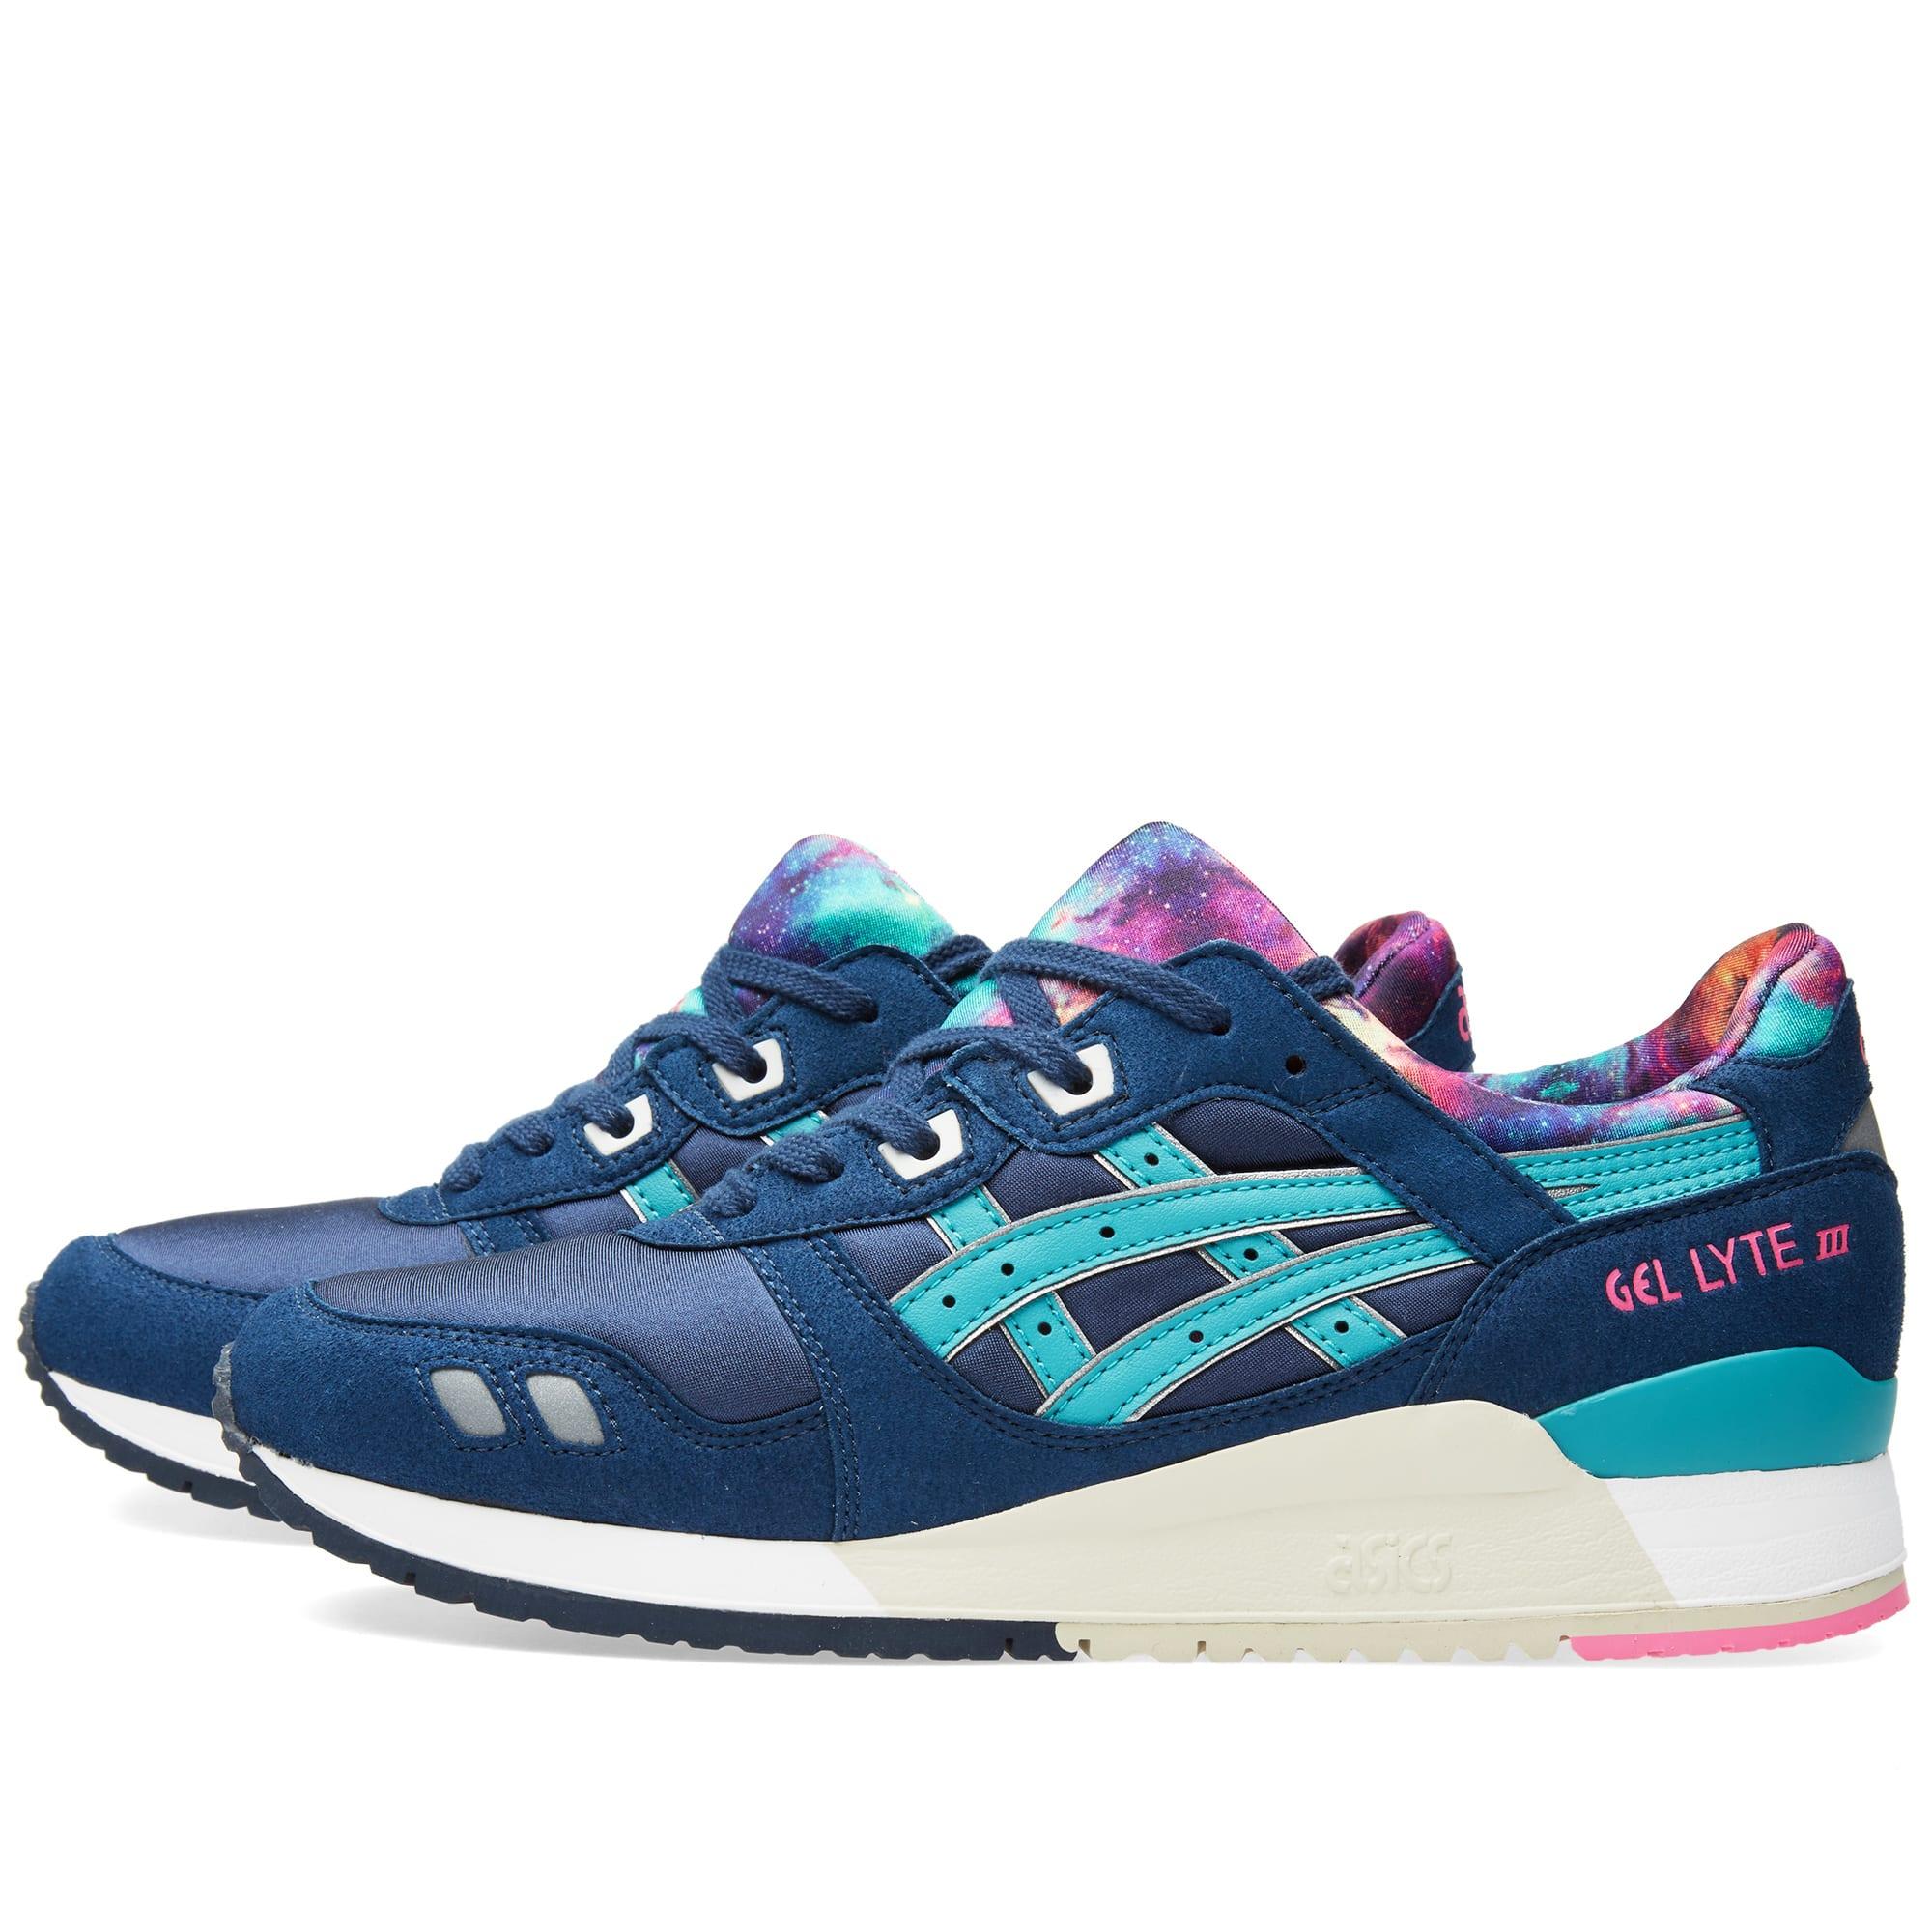 Asics Gel Lyte III GS Latigo Bay Sneakers Kids 6